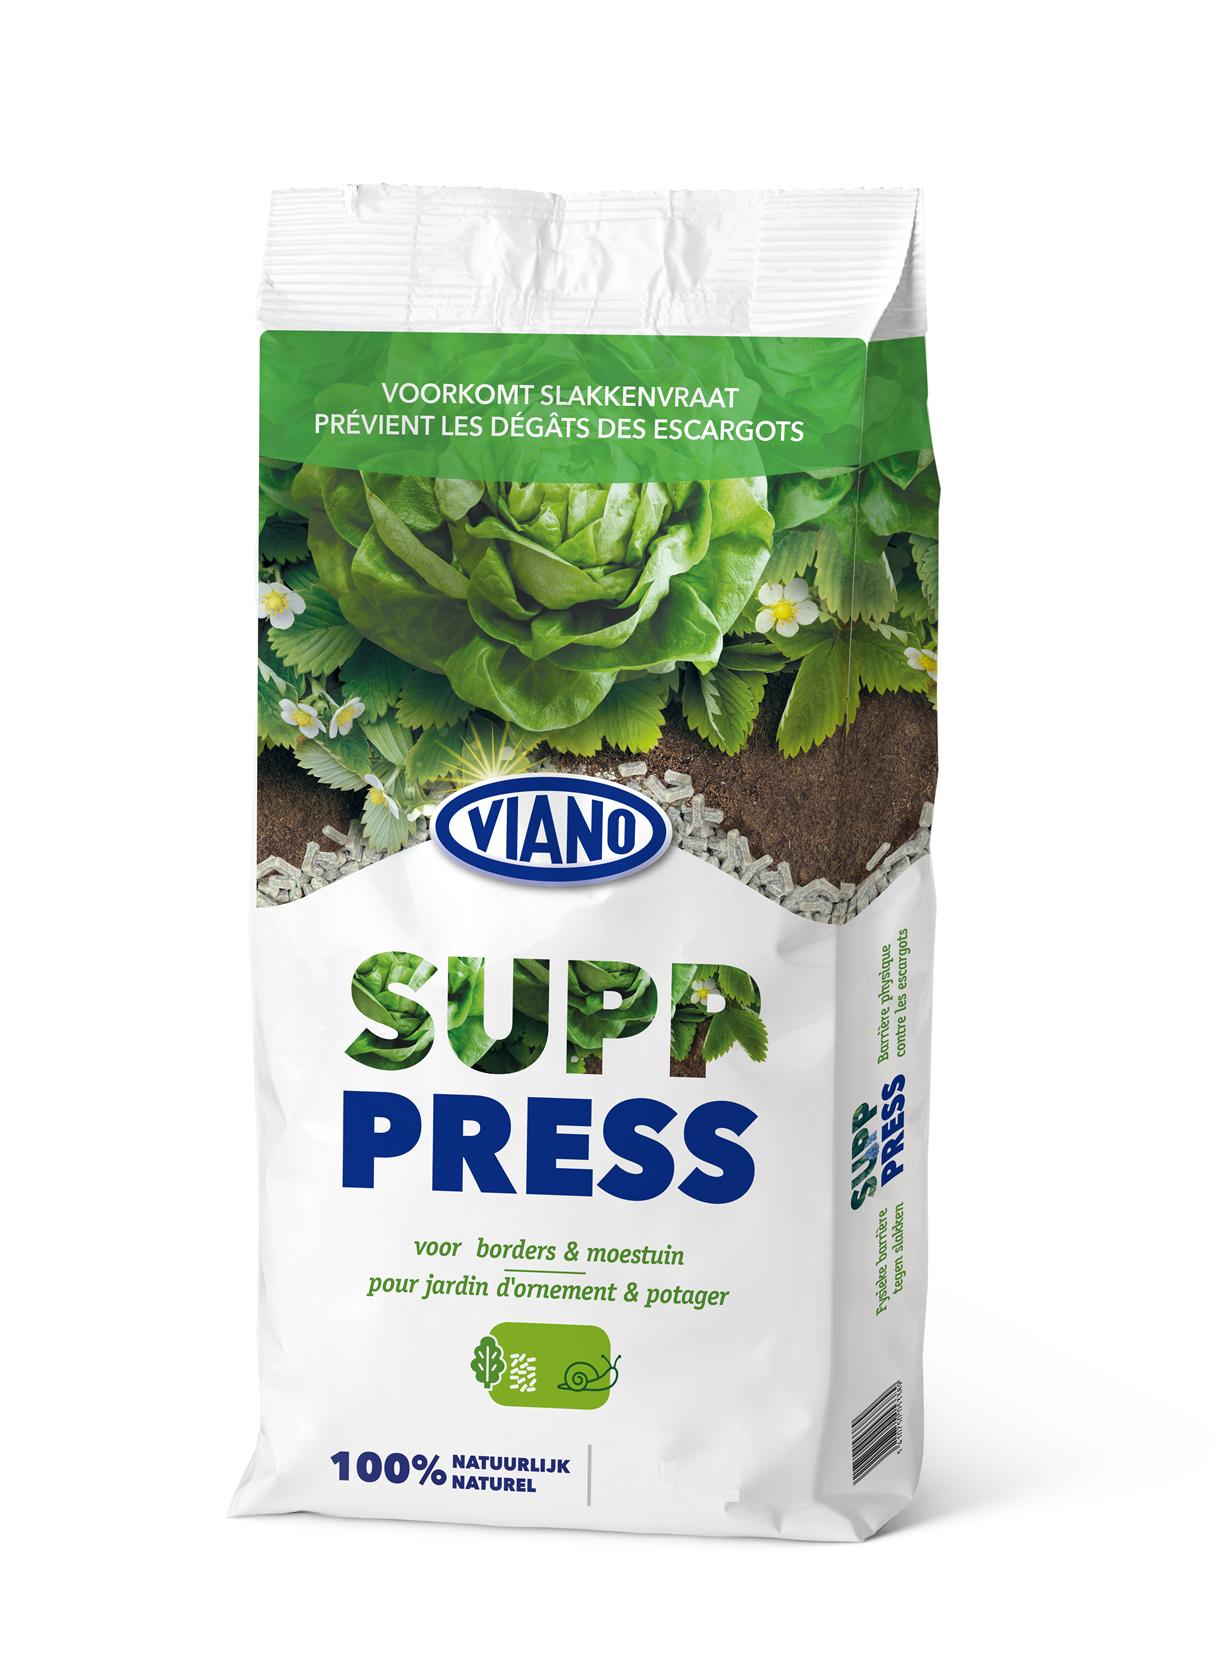 SUP-Press slakkenvraat - voorkomt slakkenvraat 6,5L